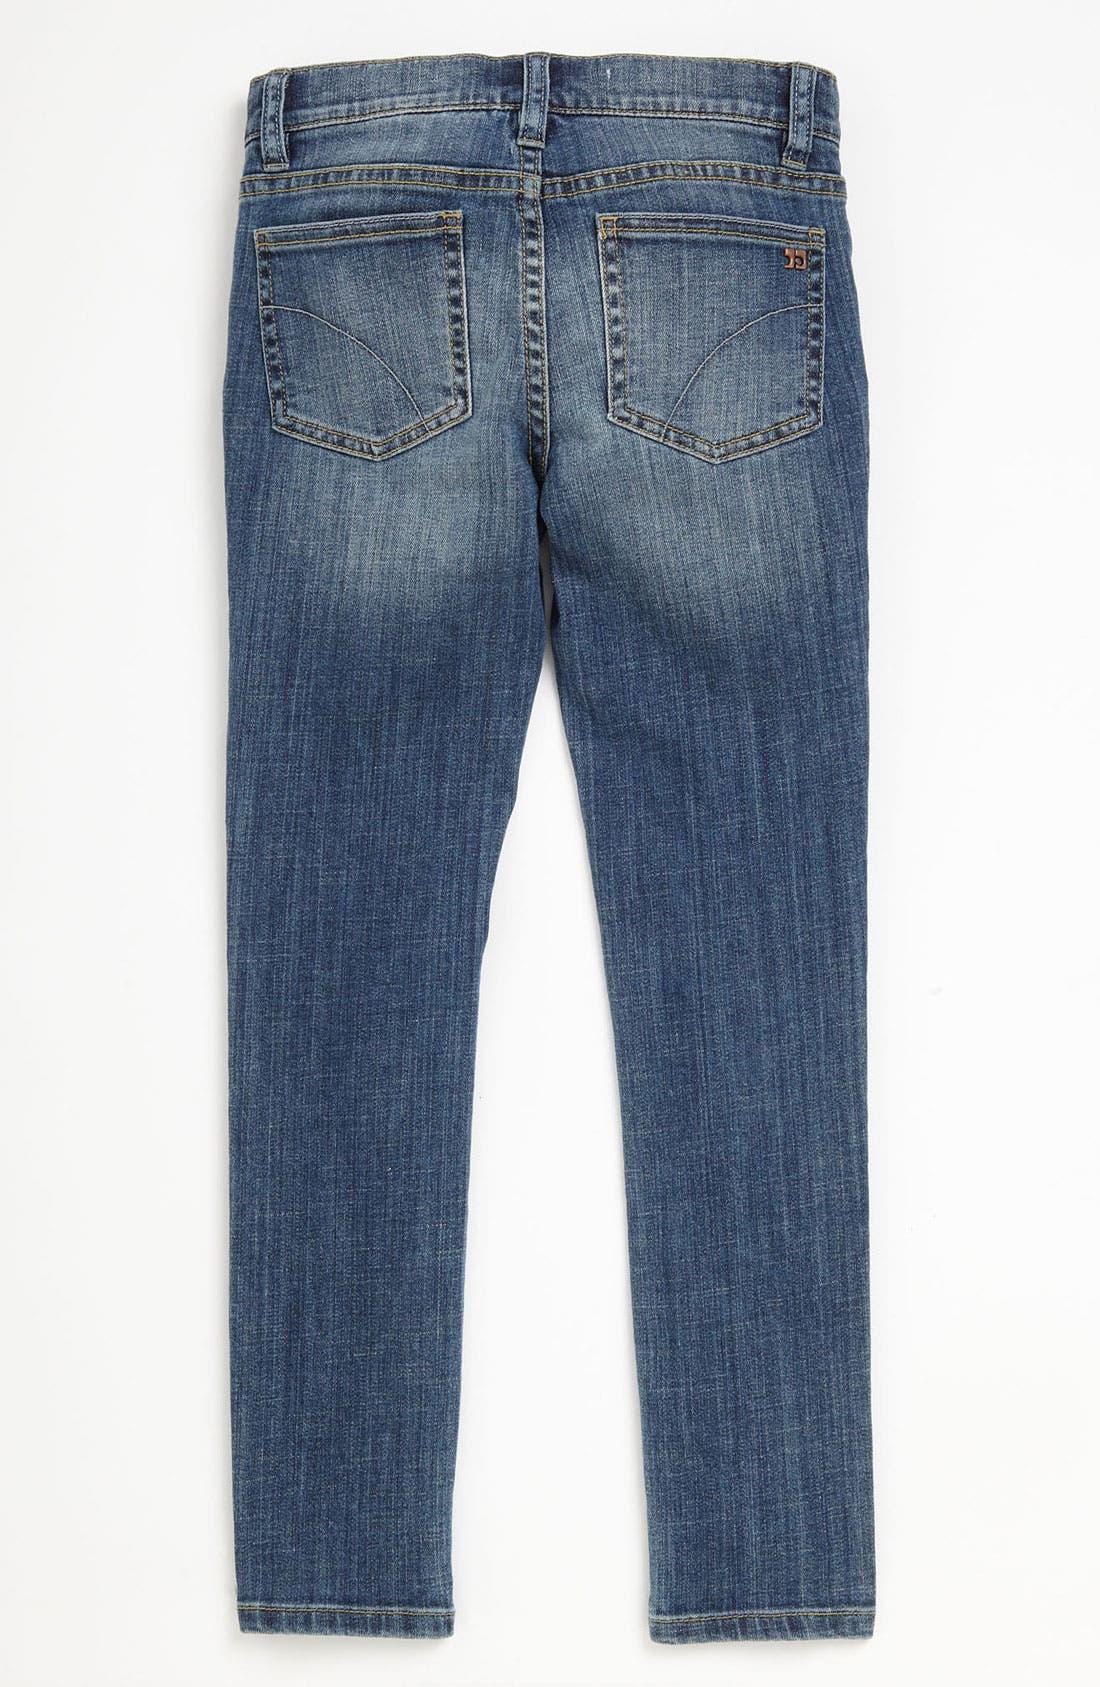 Alternate Image 1 Selected - Joe's Skinny Jeans (Big Girls)